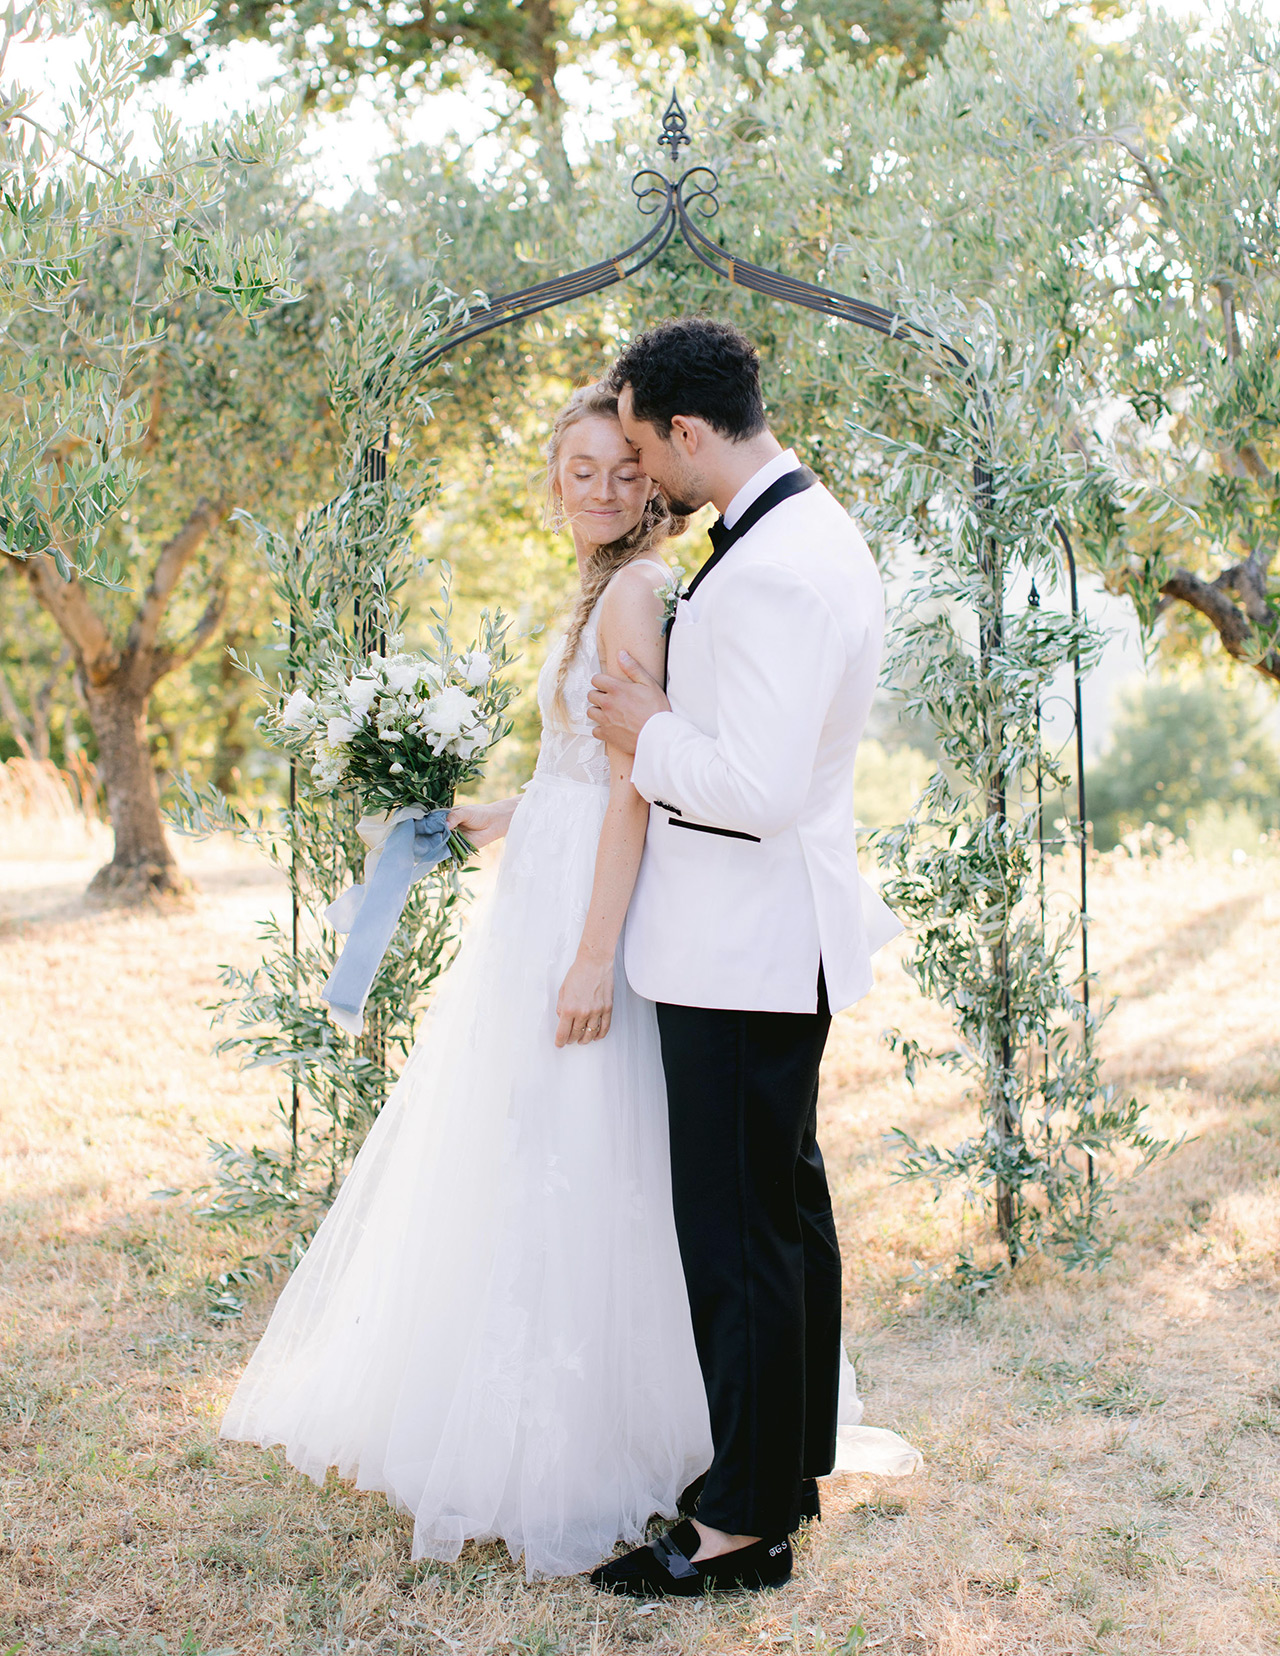 bride groom pose olive branch wedding arch